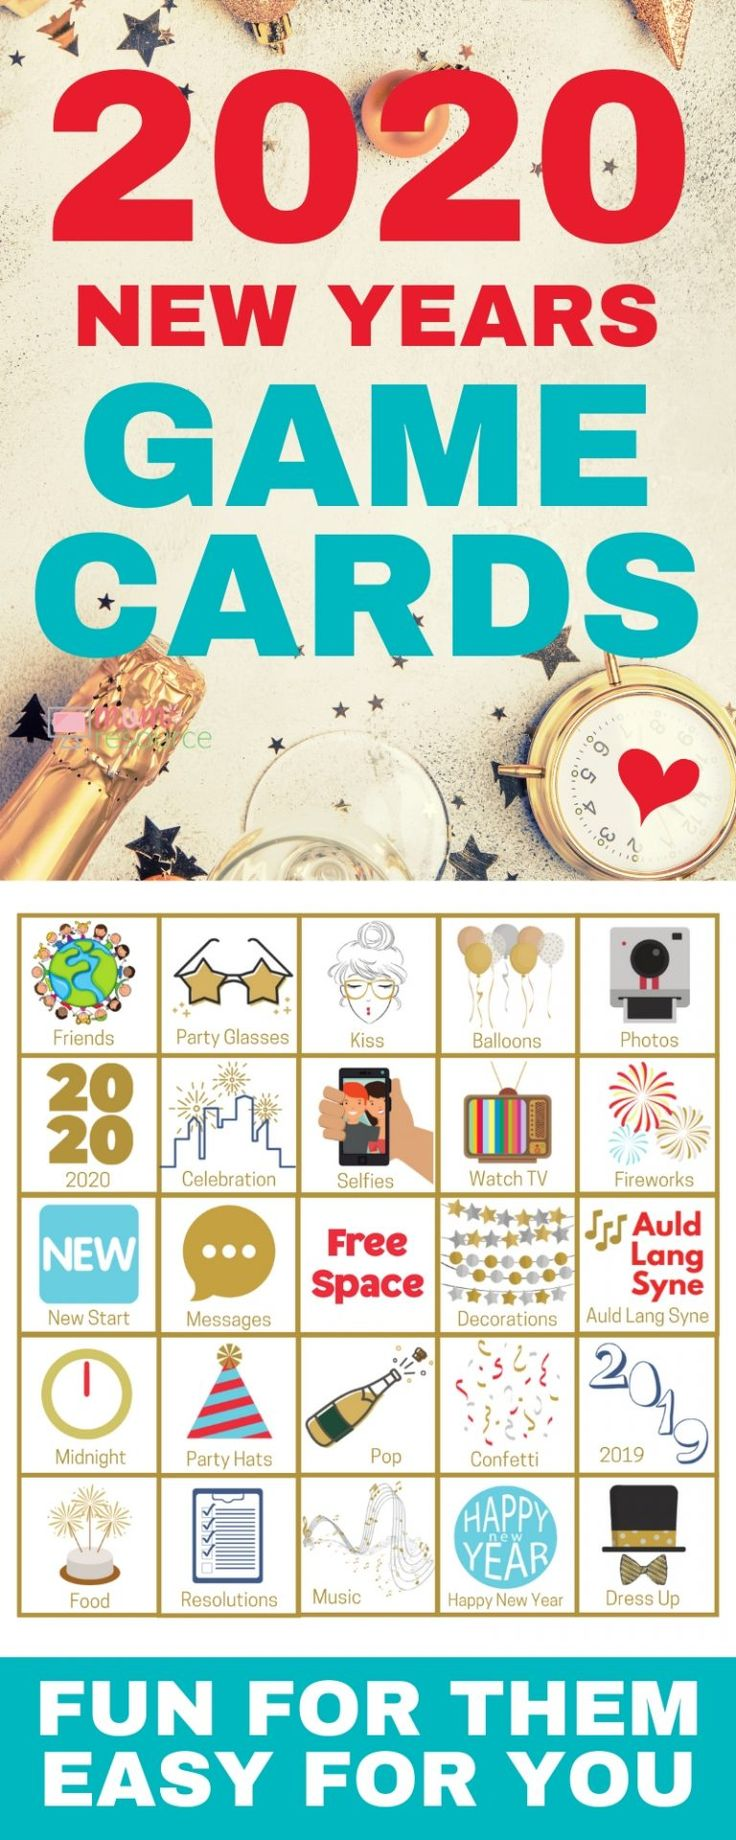 New Years Even bingo cards easy to play, modern & fun